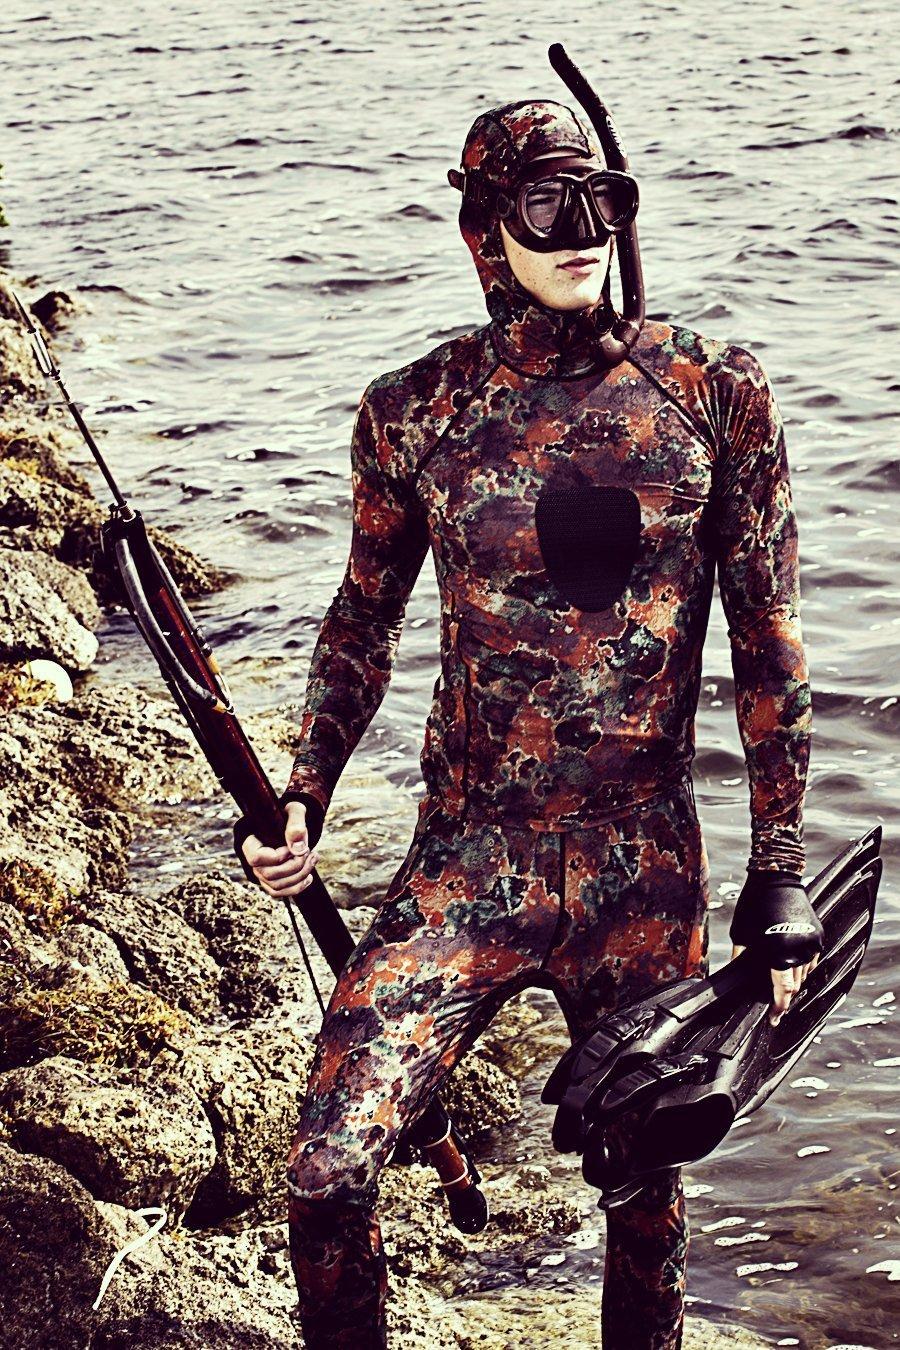 Amazon.com: Tilos, UV Spearfishing camuflaje Licra ...